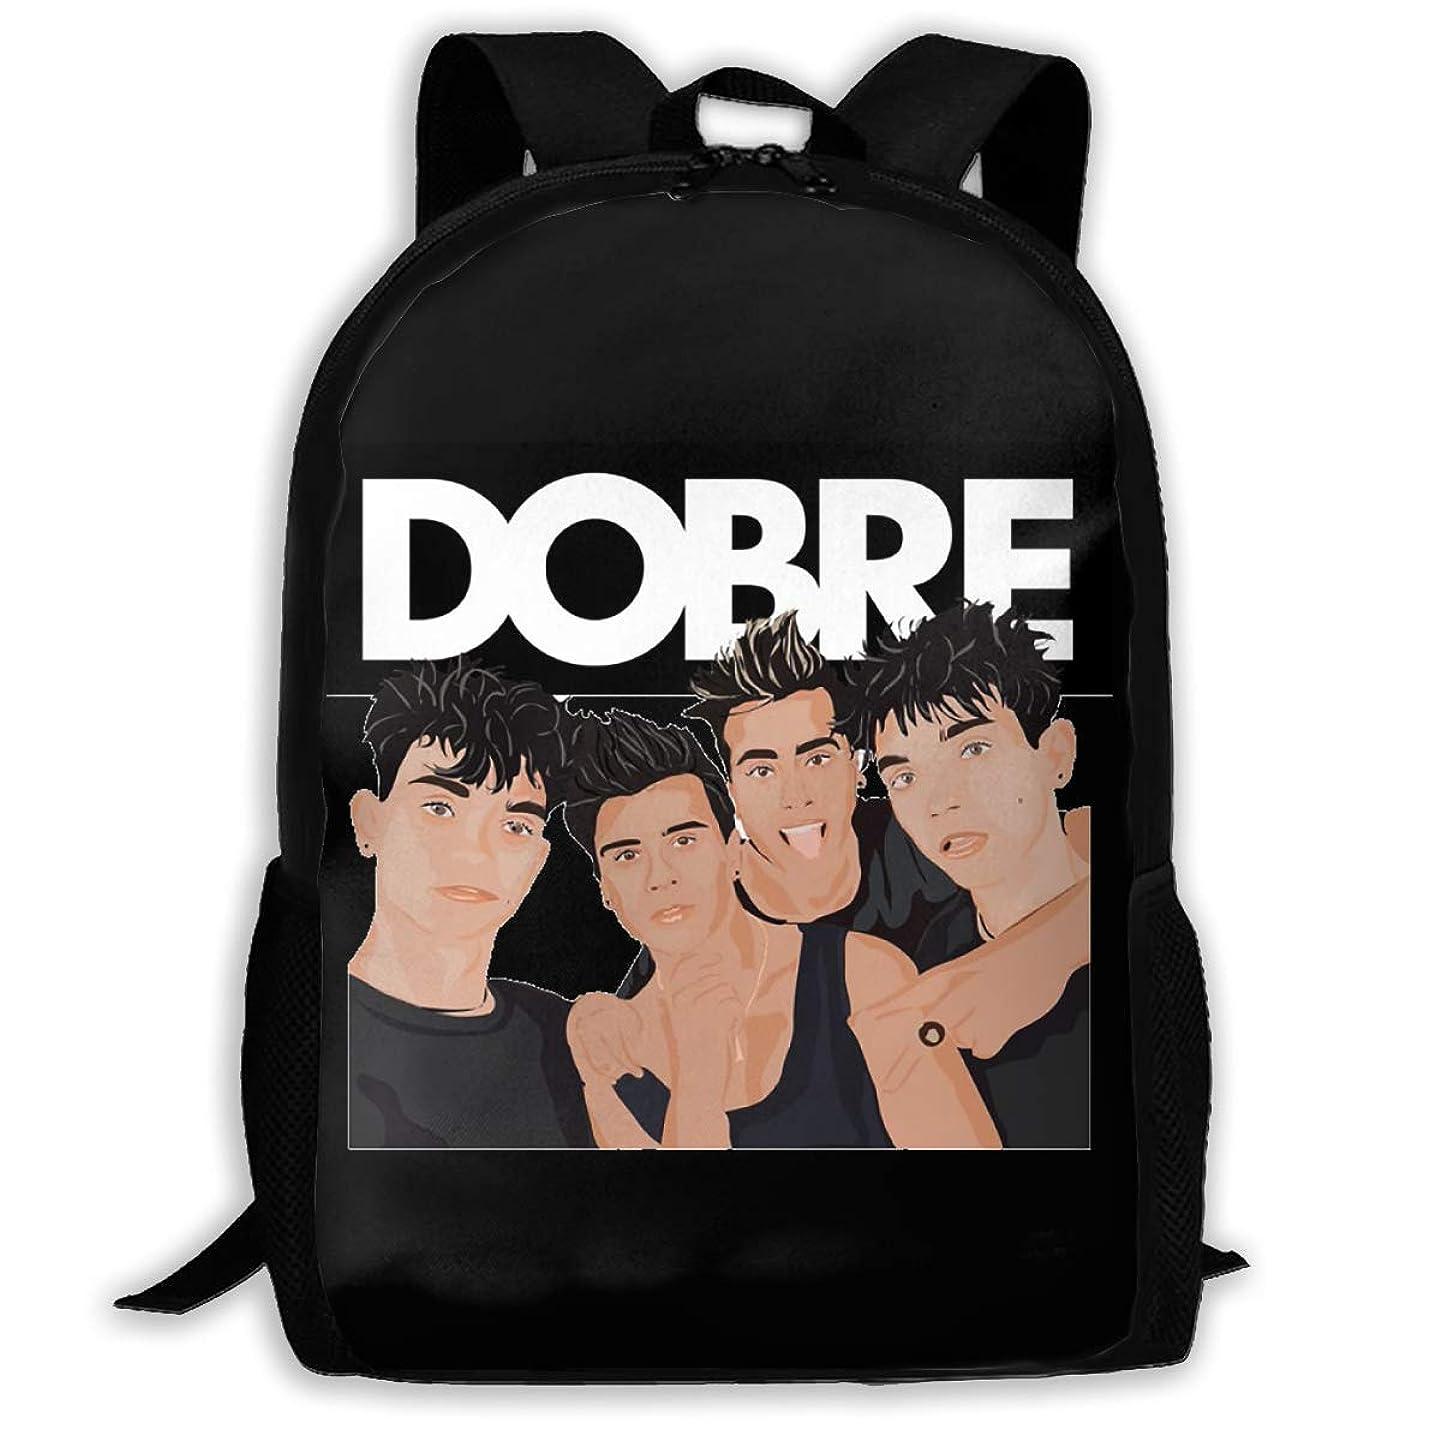 Sunmoonet Backpack for Men Women,Dobre Brothers Backpacks Hiking Laptop Backpack Travel Large Shoulder Bags for School Shopping Outdoor Sports